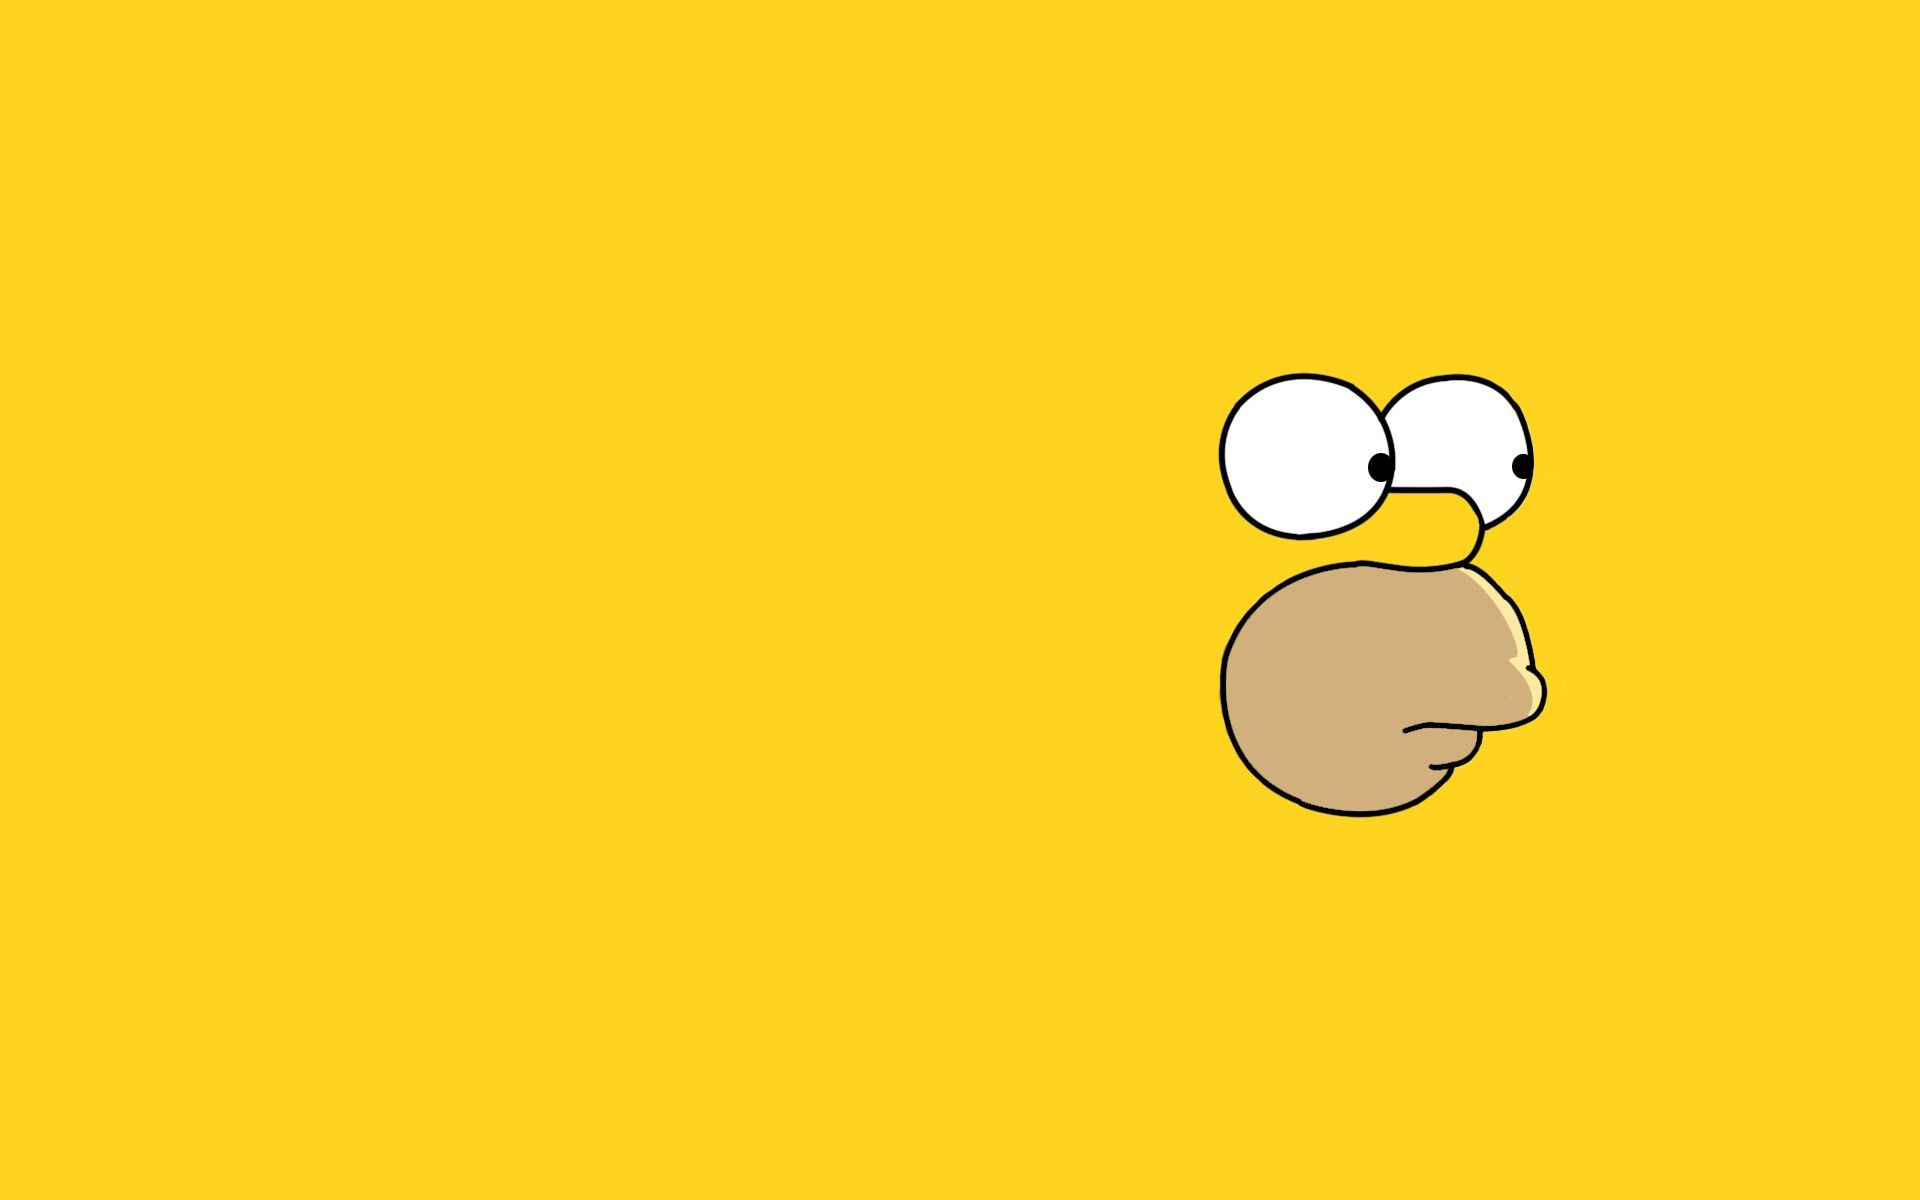 Homer Simpson 1920x1200 HD Wallpaper The Simpsons